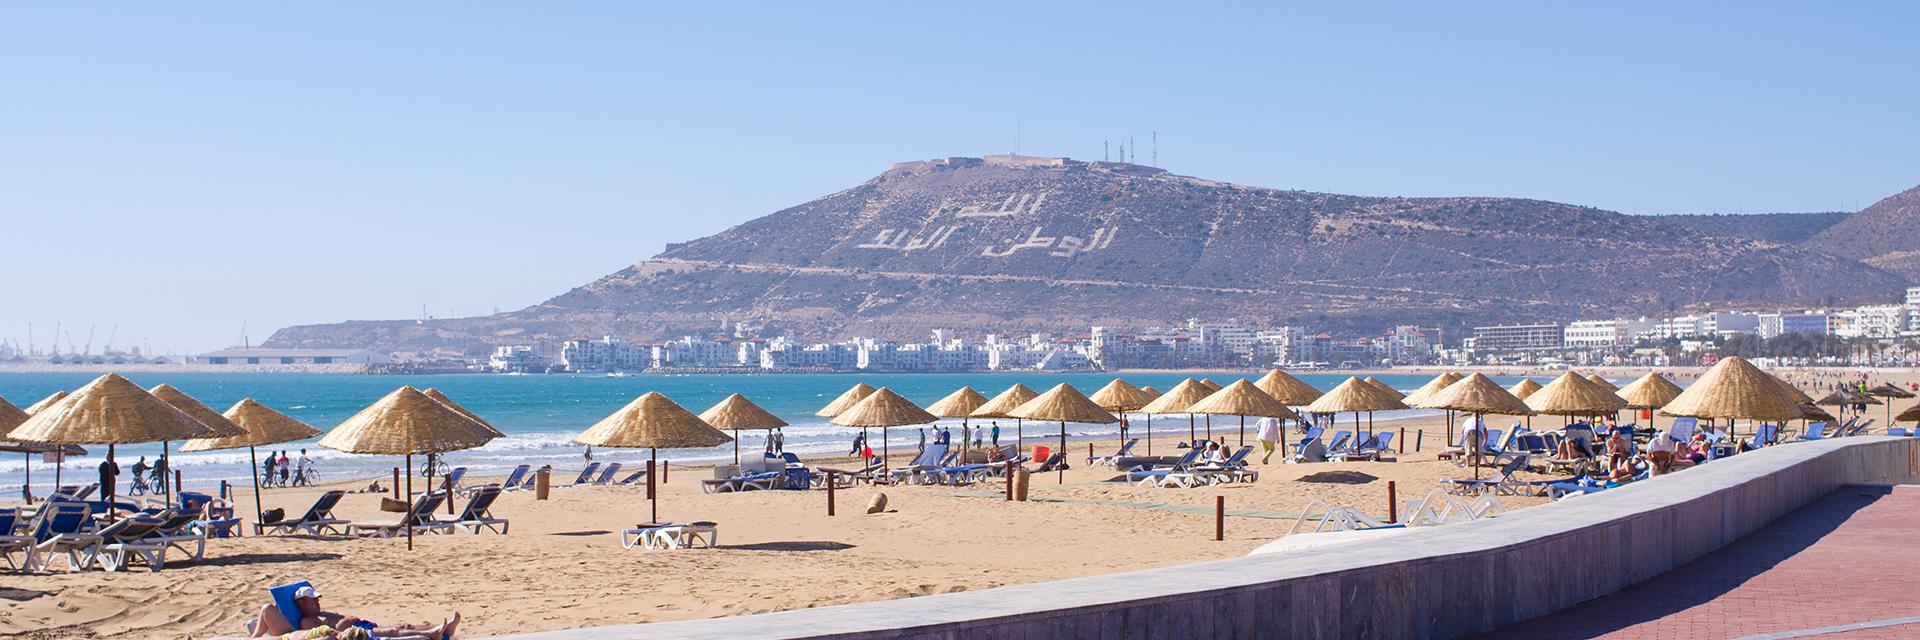 Transfert aéroport Agadir